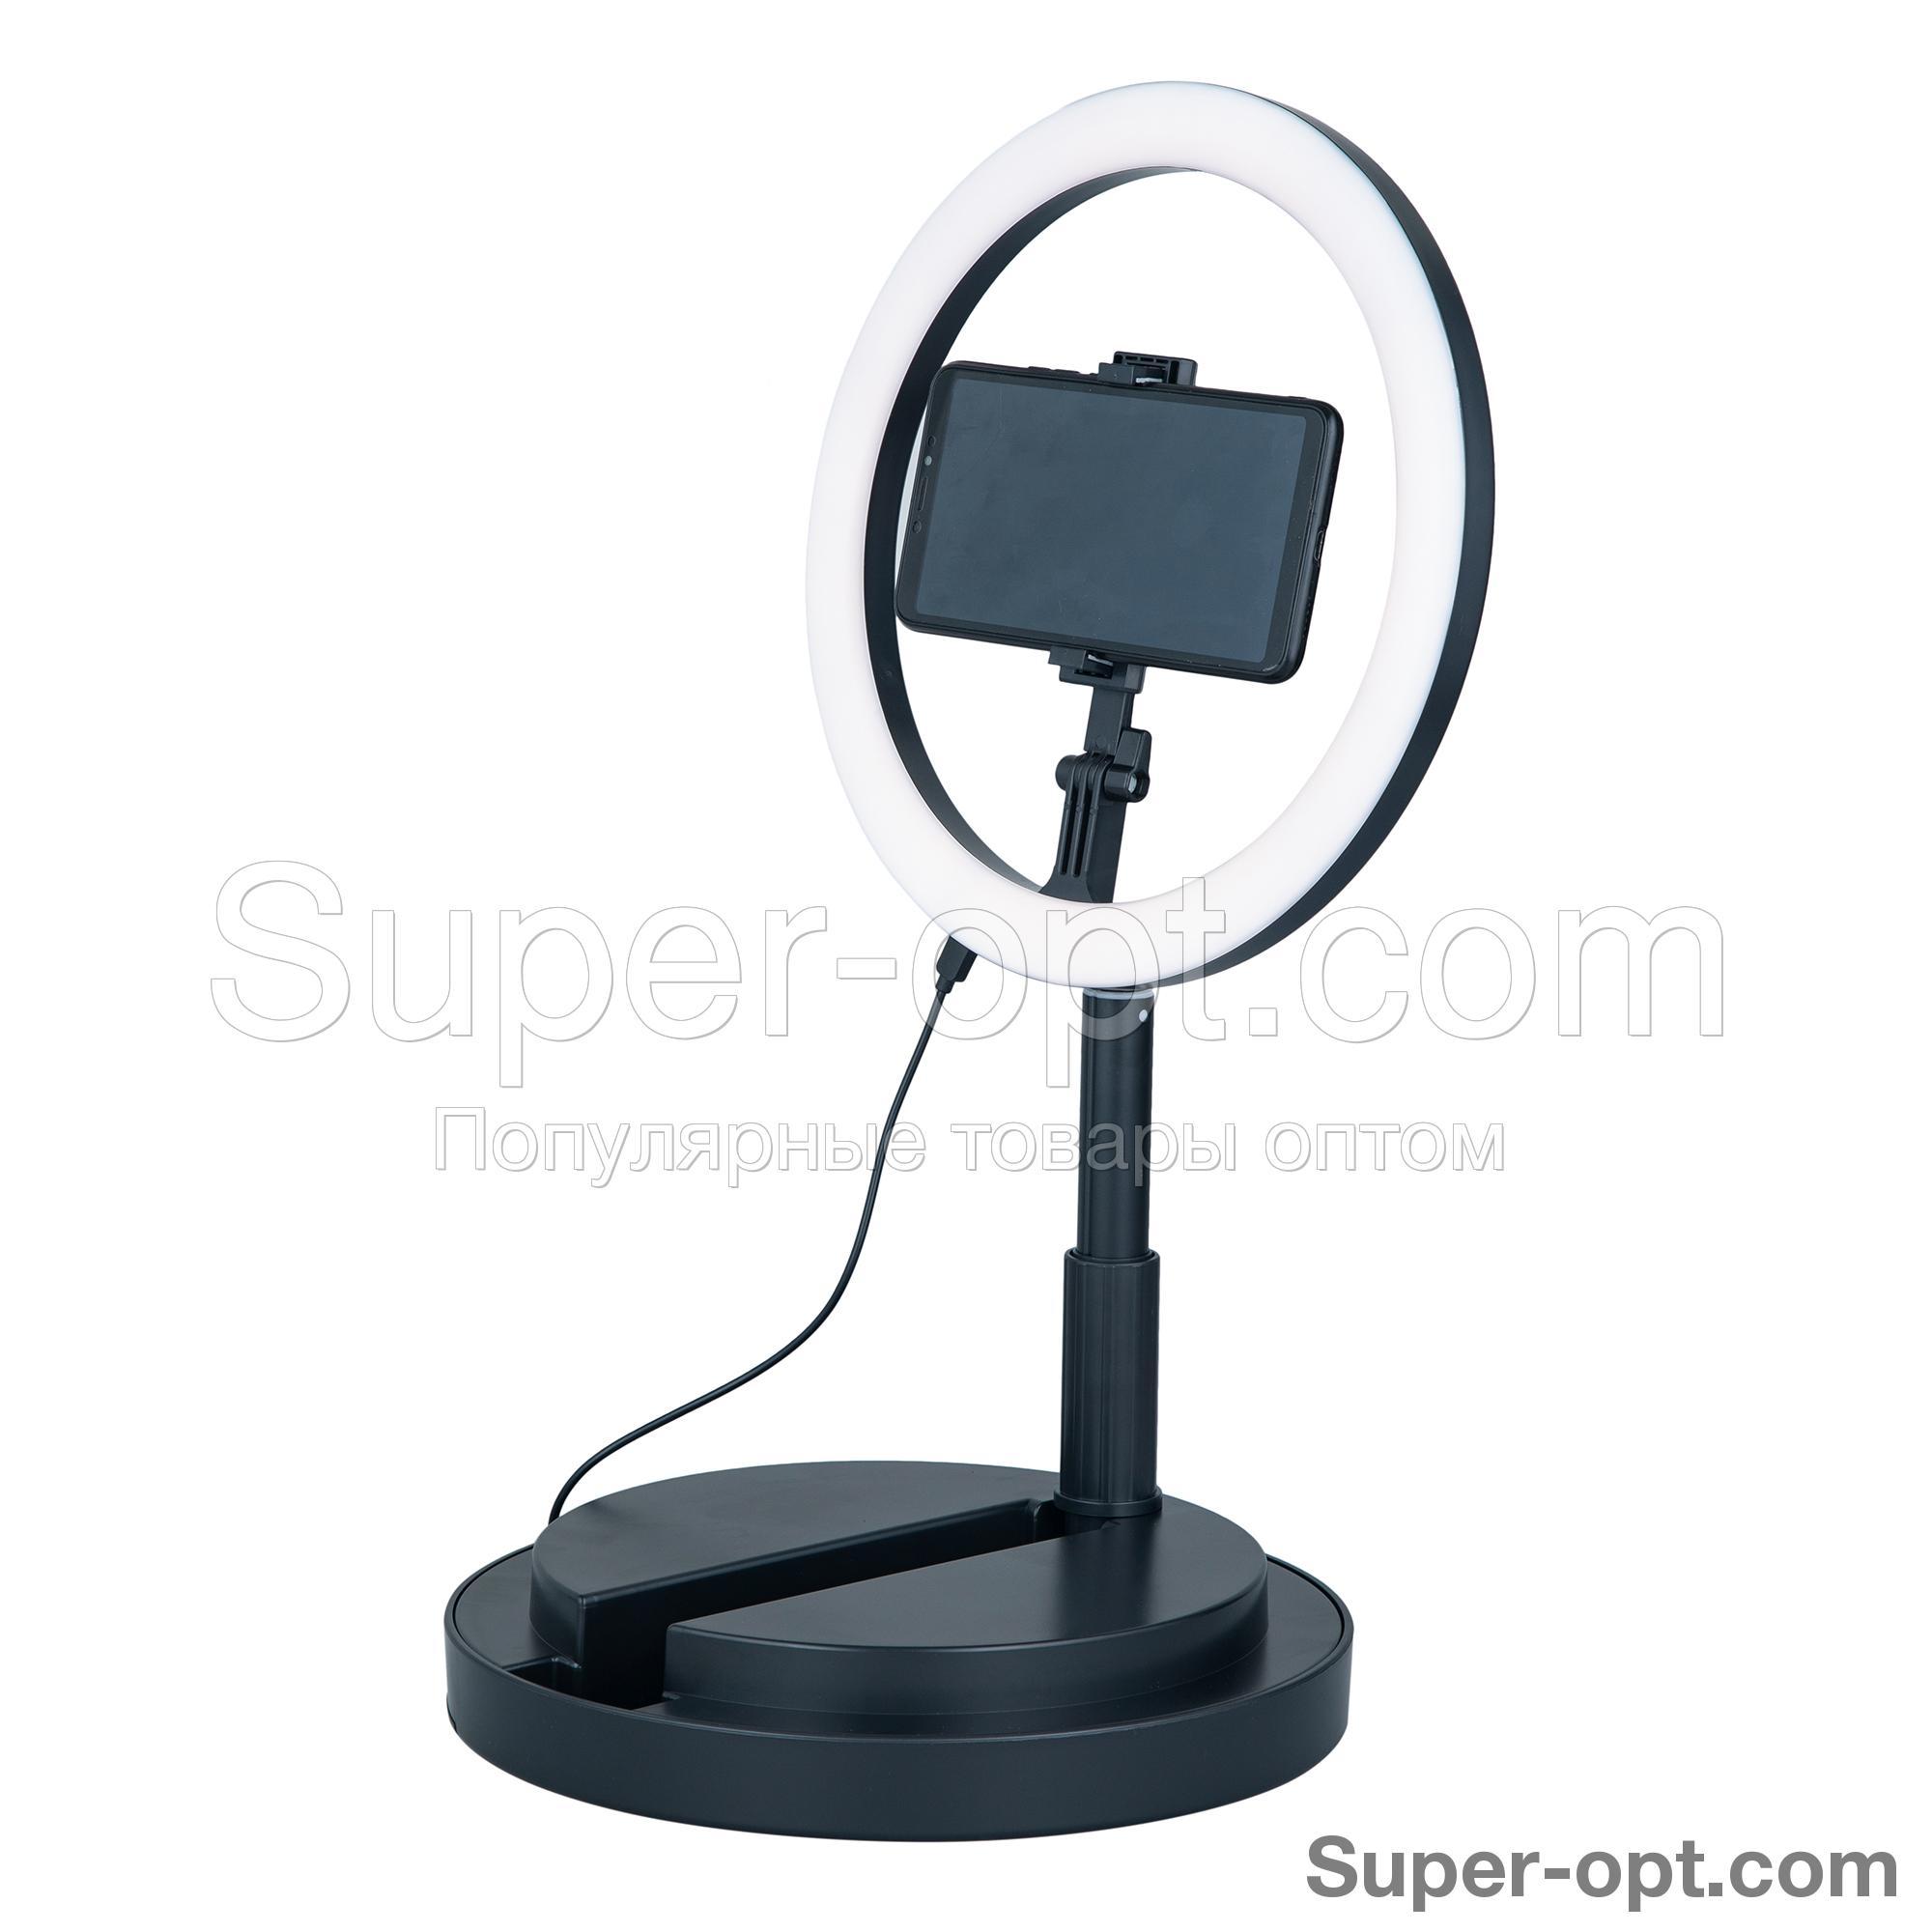 Кольцевая лампа Live Beauty Light 29 см оптом